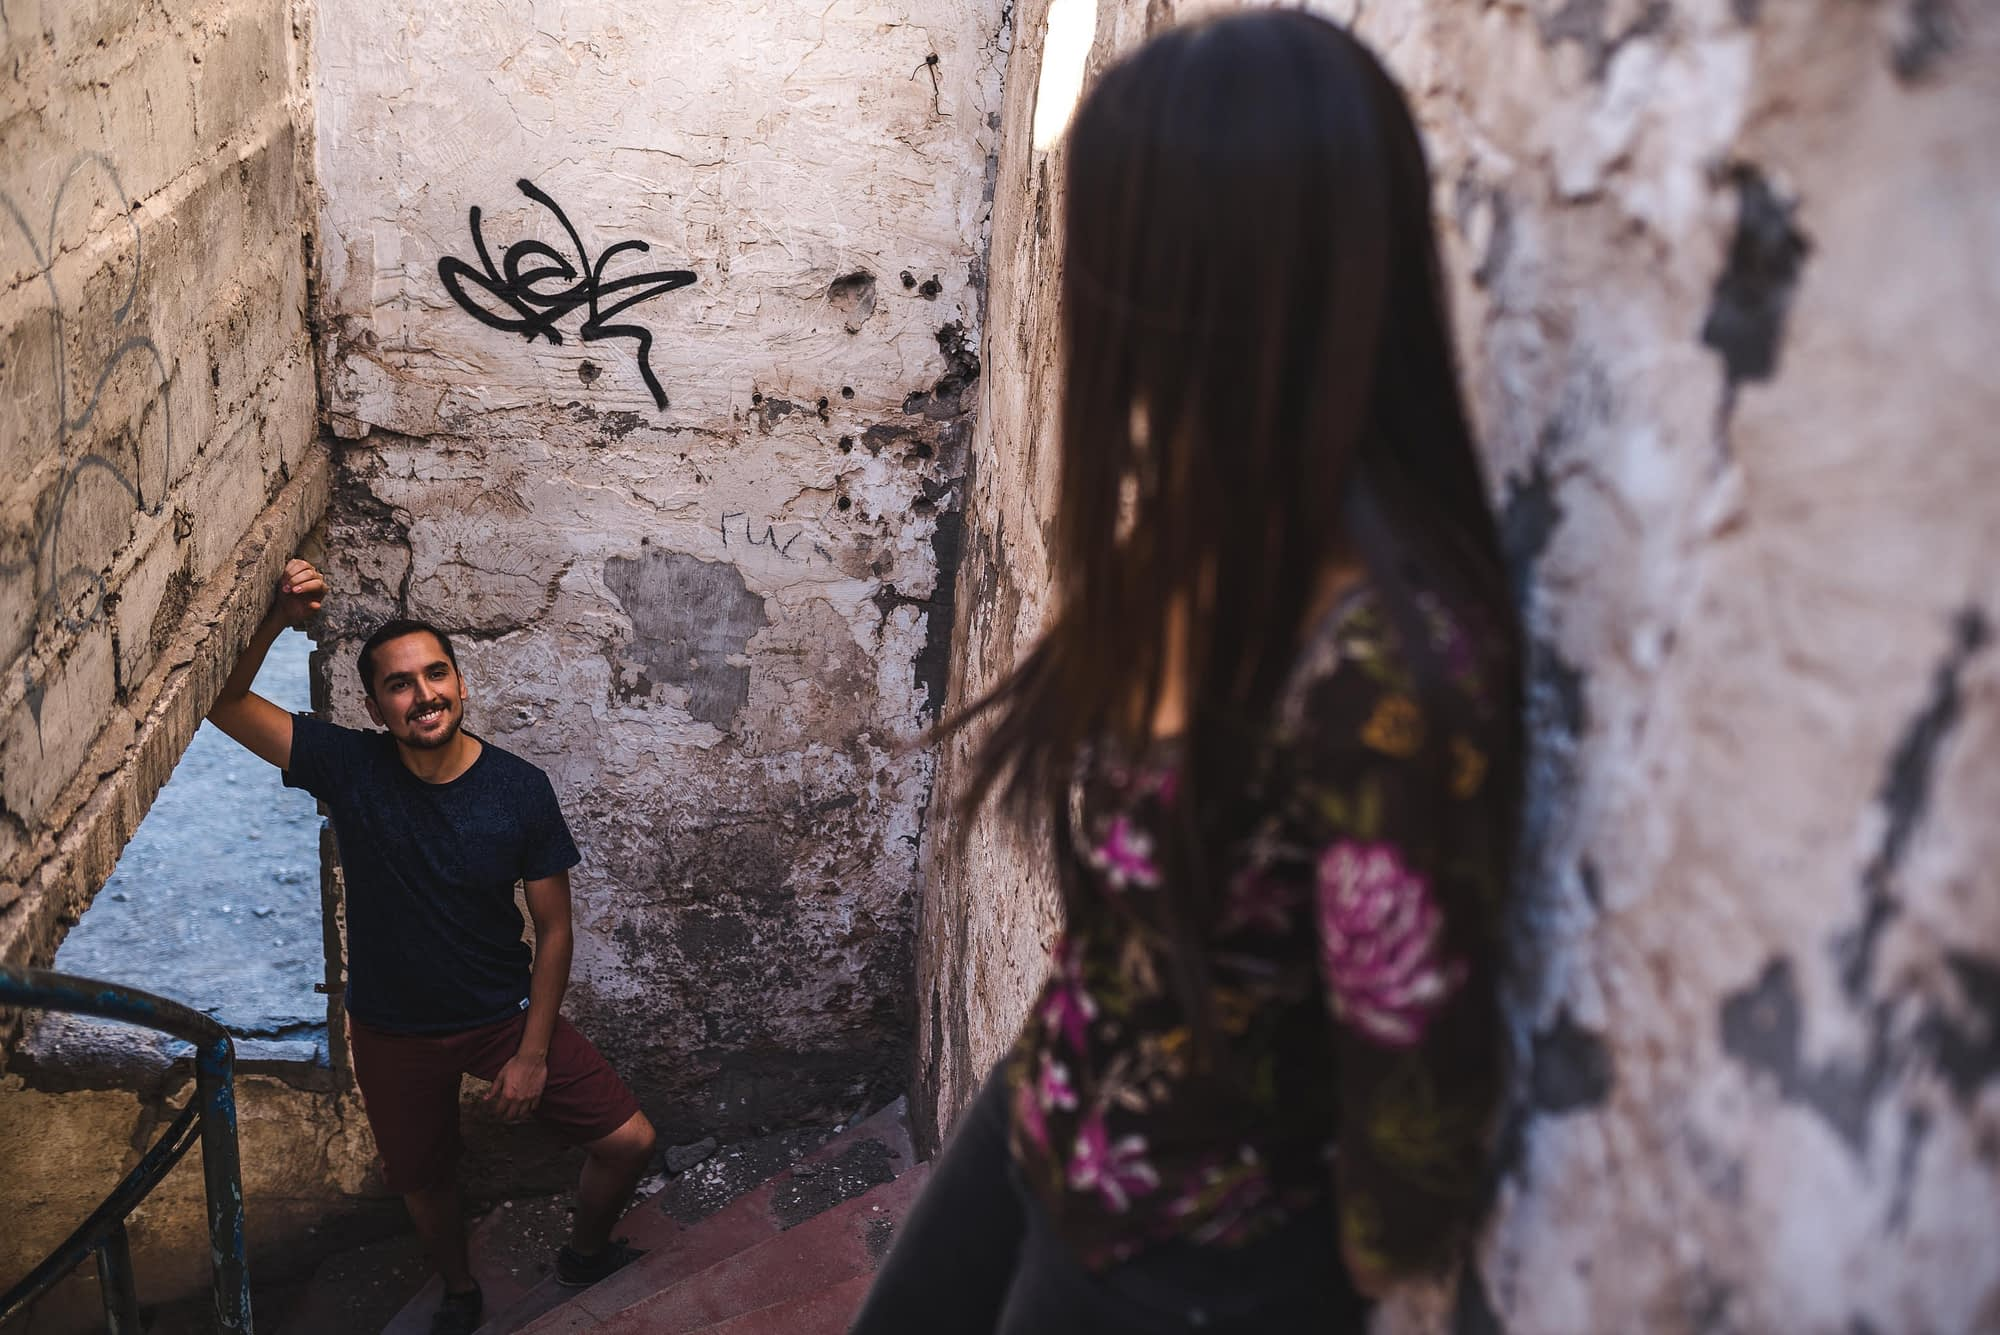 embalse del yeso-fotografo de matrimonios-fotografo-fotografo documental de matrimonios